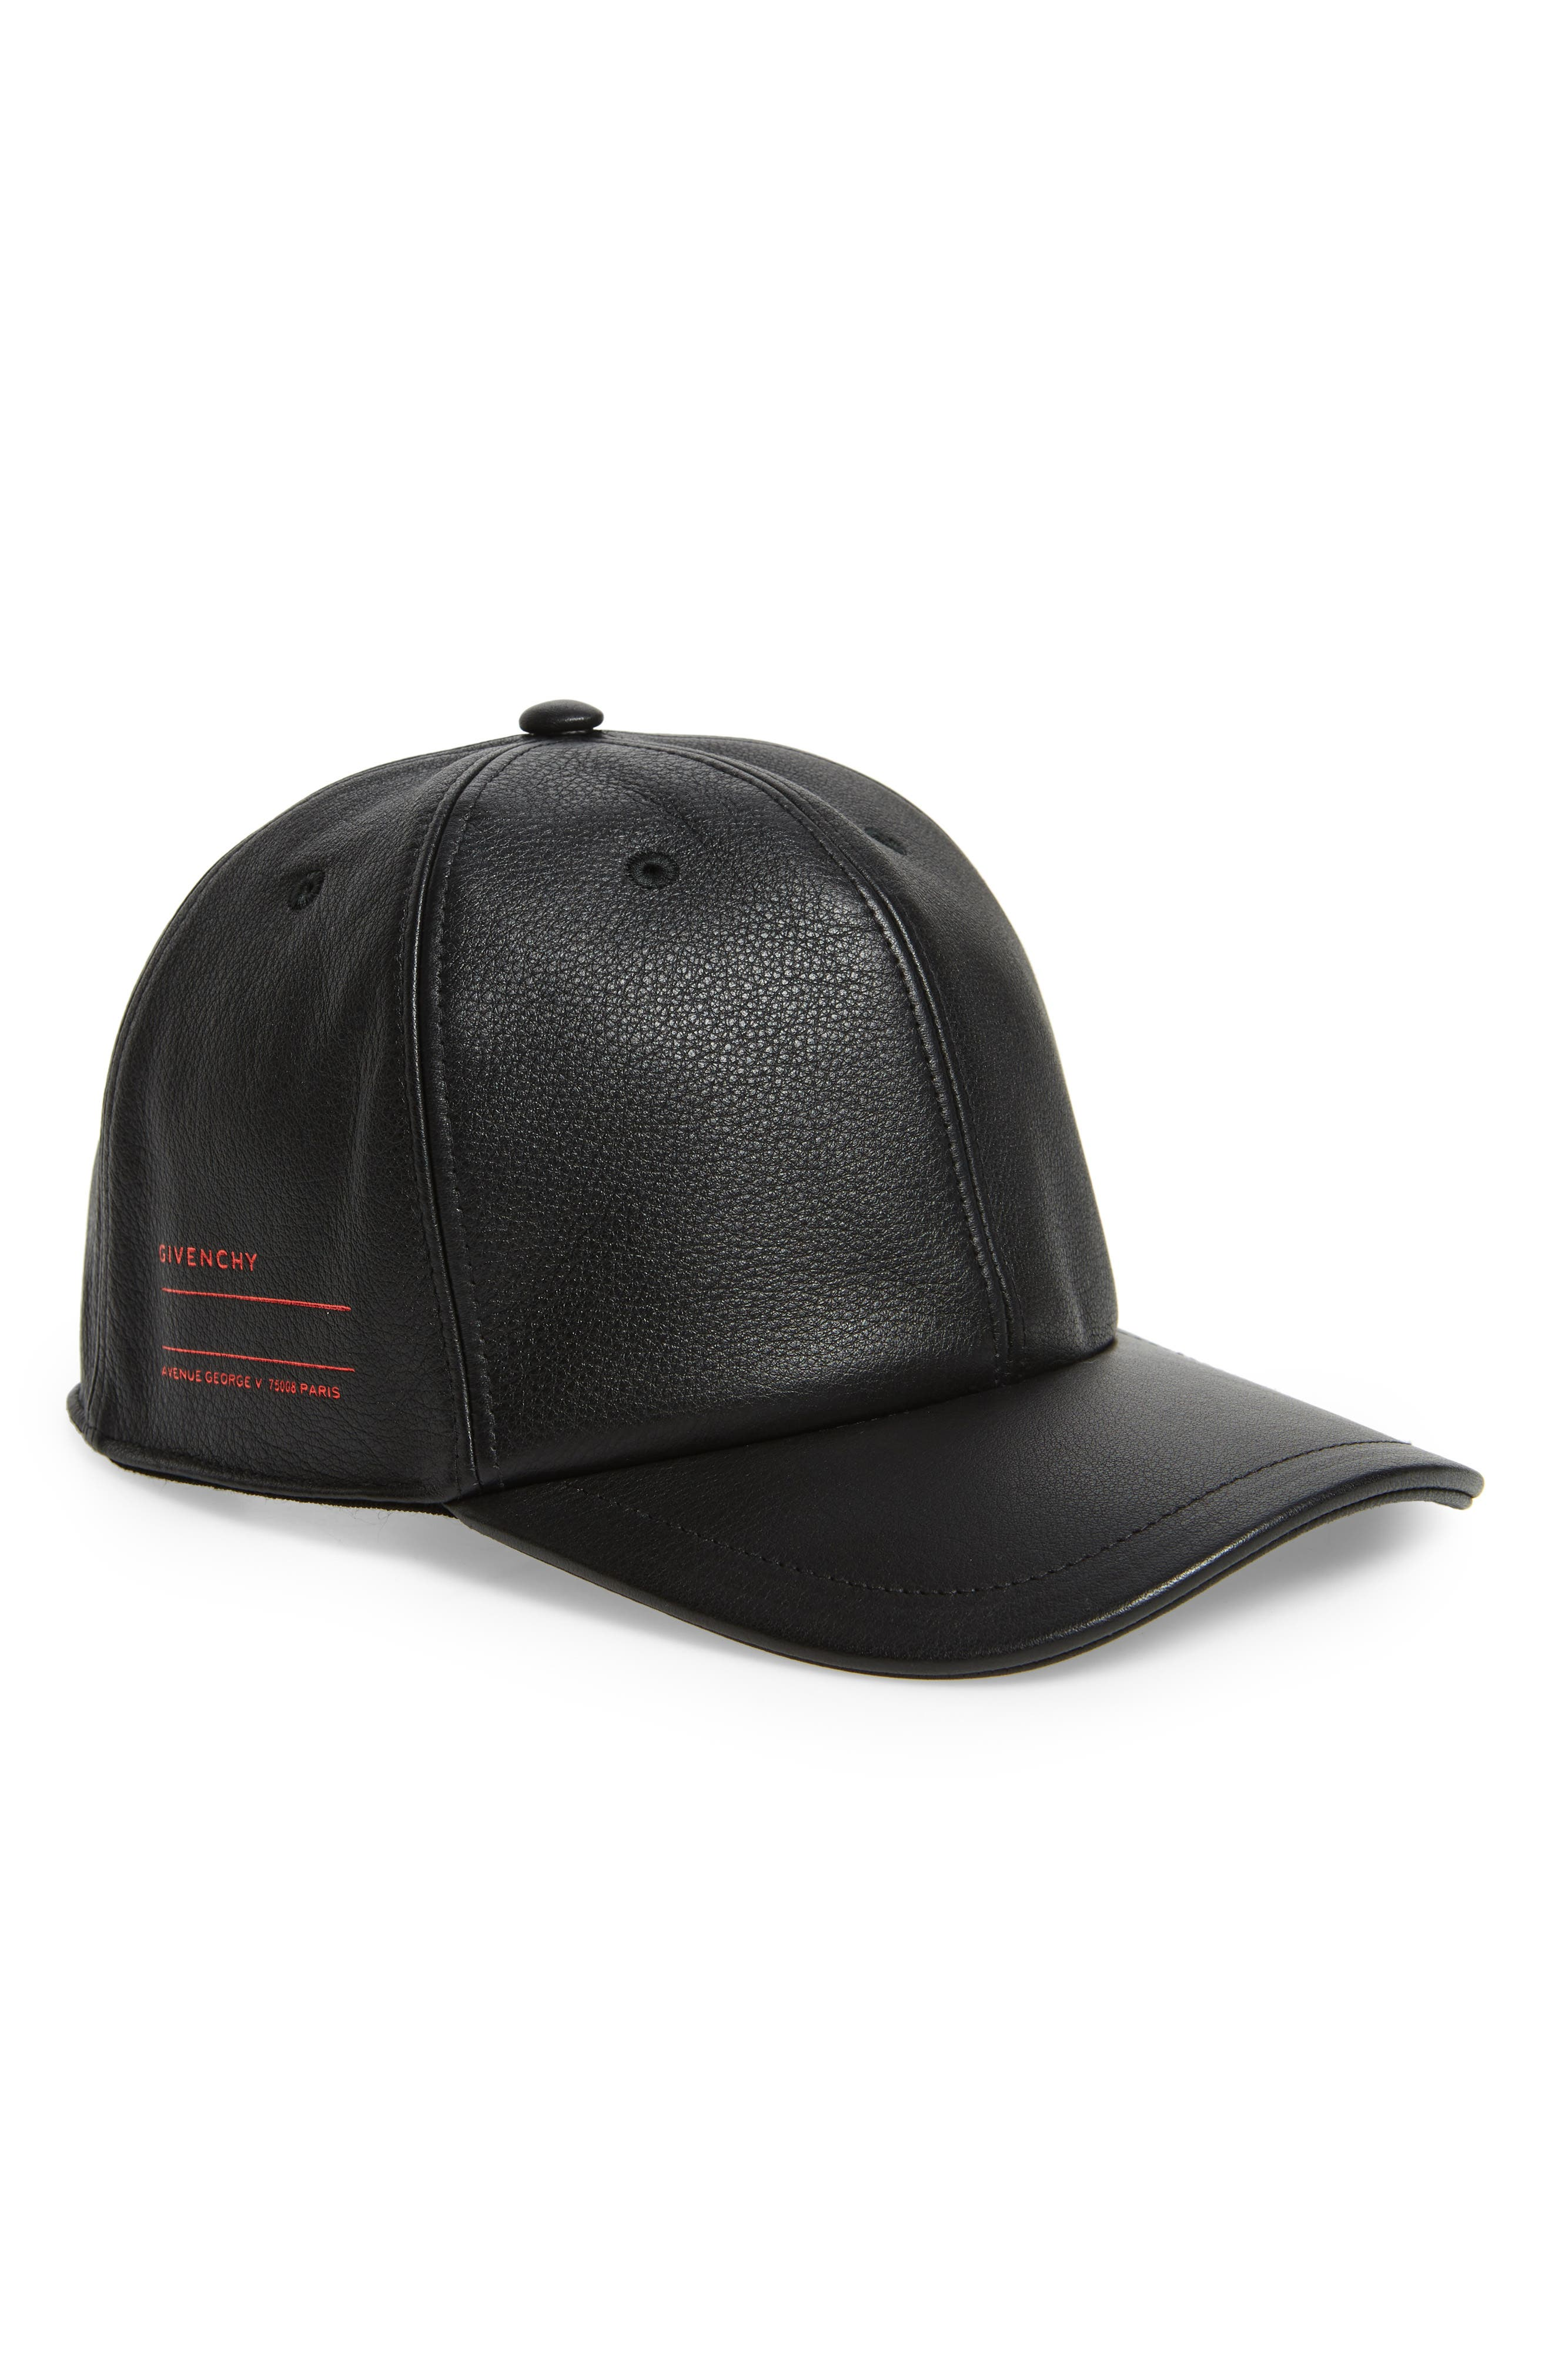 Leather Ball Cap,                             Main thumbnail 1, color,                             Black/ White